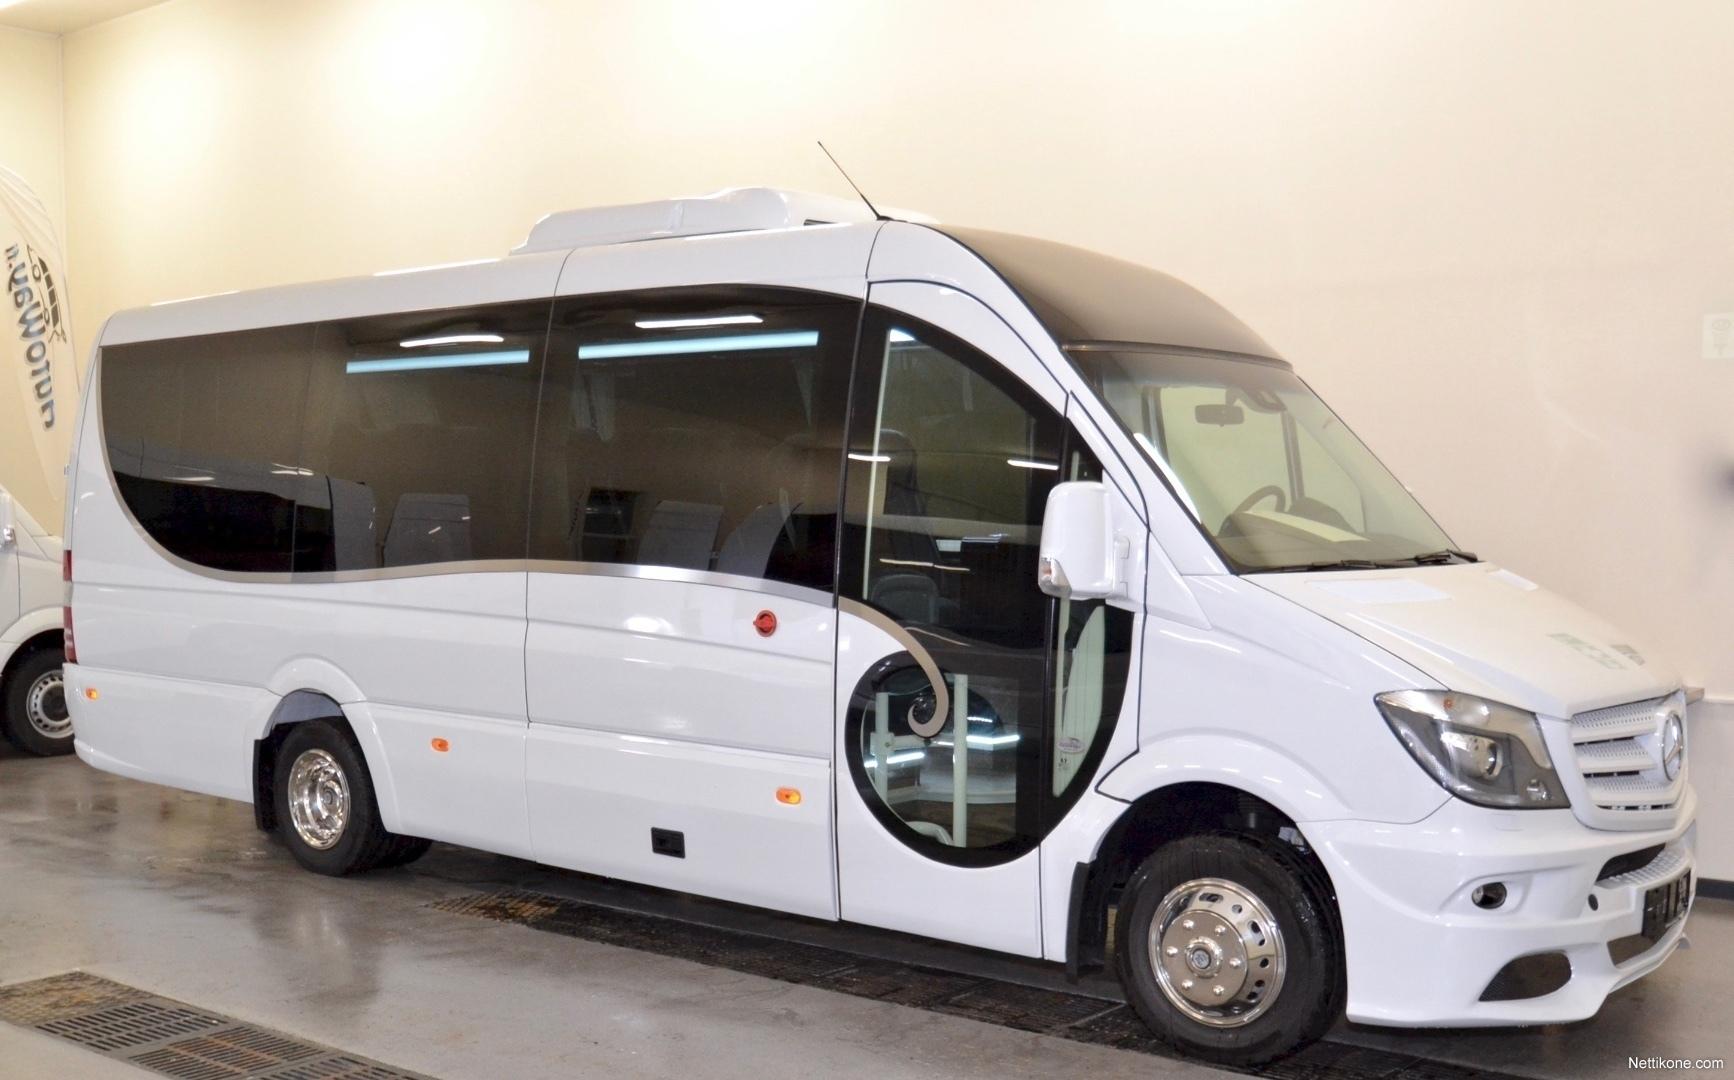 Mercedes benz sprinter 519 cdi bus coach 2018 nettikone for Mercedes benz sprinter accessories